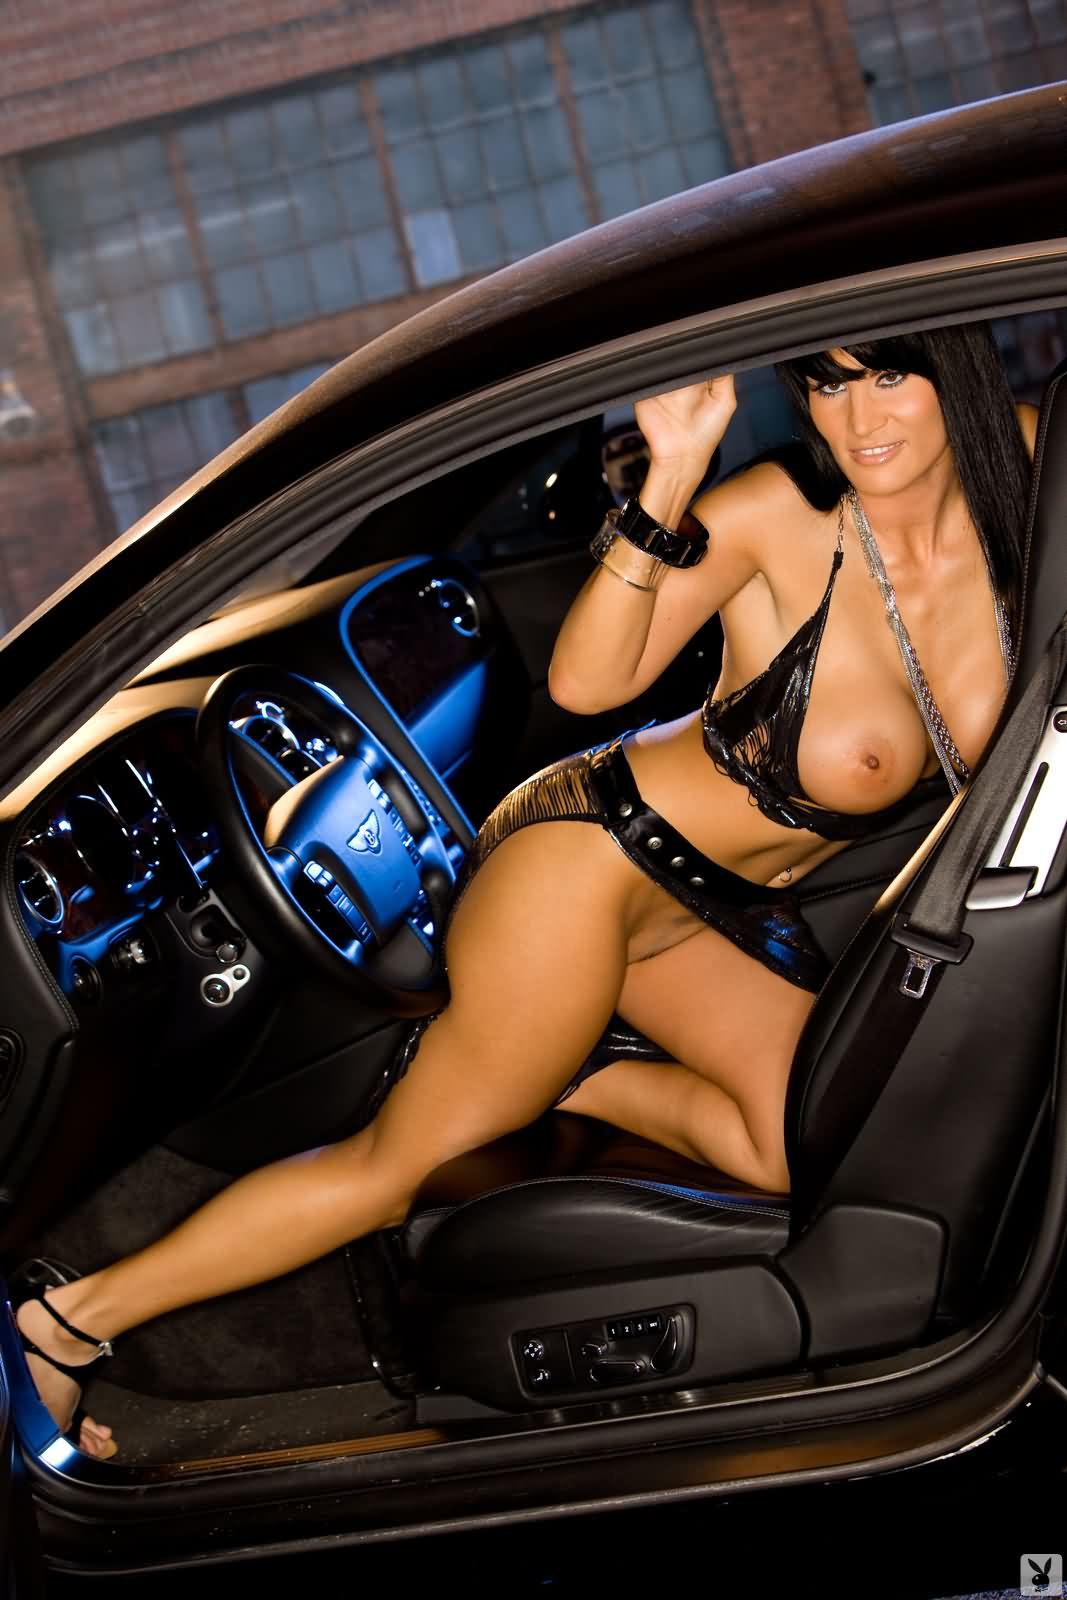 XXX Sex Photos socal val sex tape